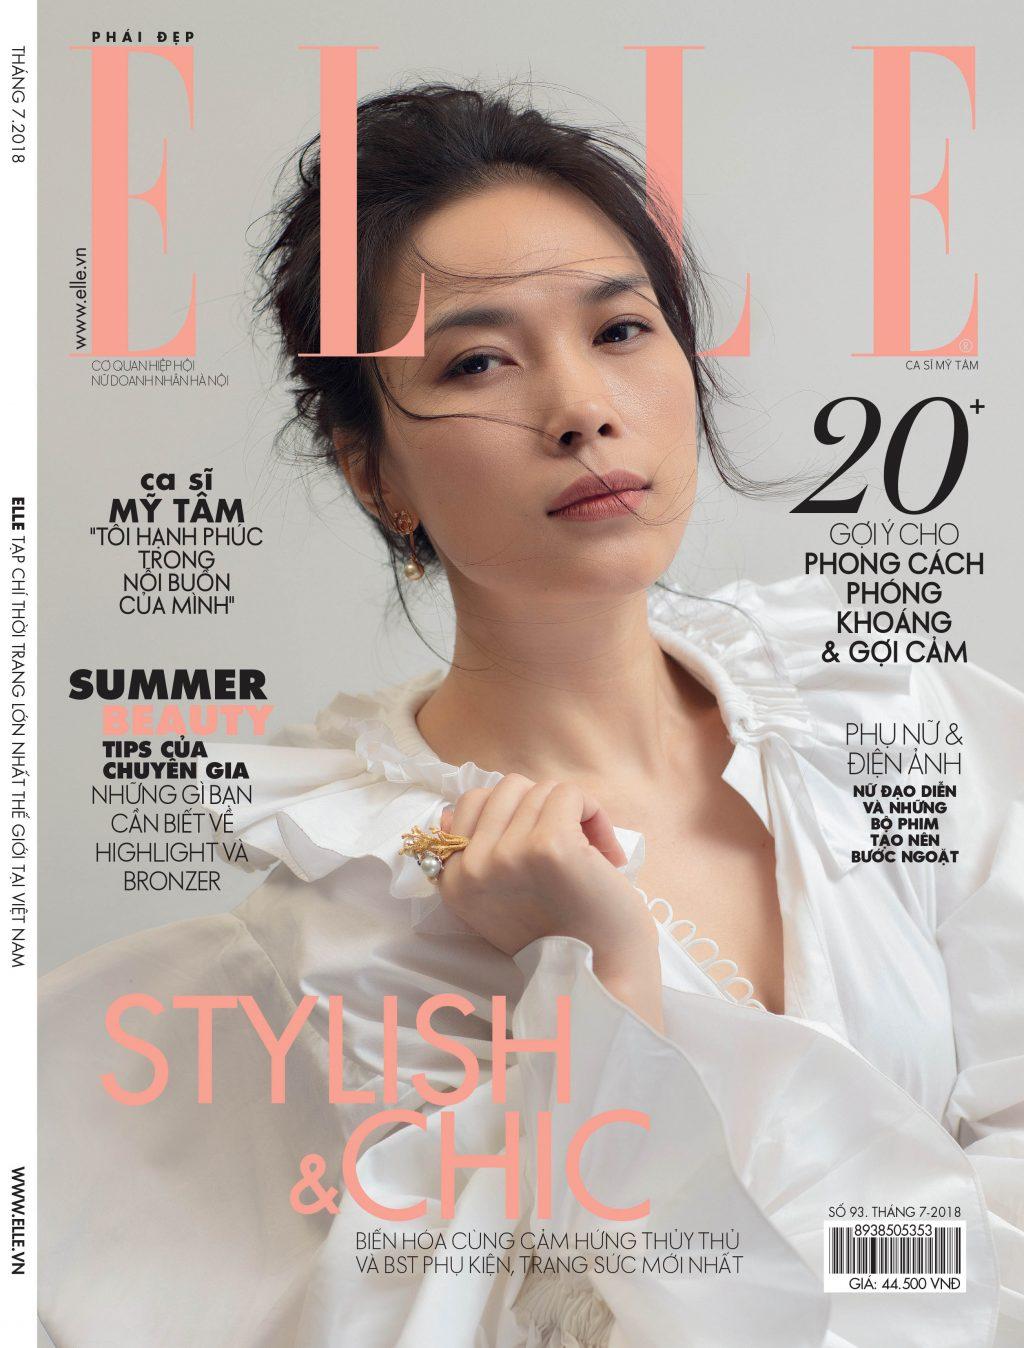 ELLE-STYLE-AWARDS-2019- Trang bìa ELLE Mỹ Tâm-